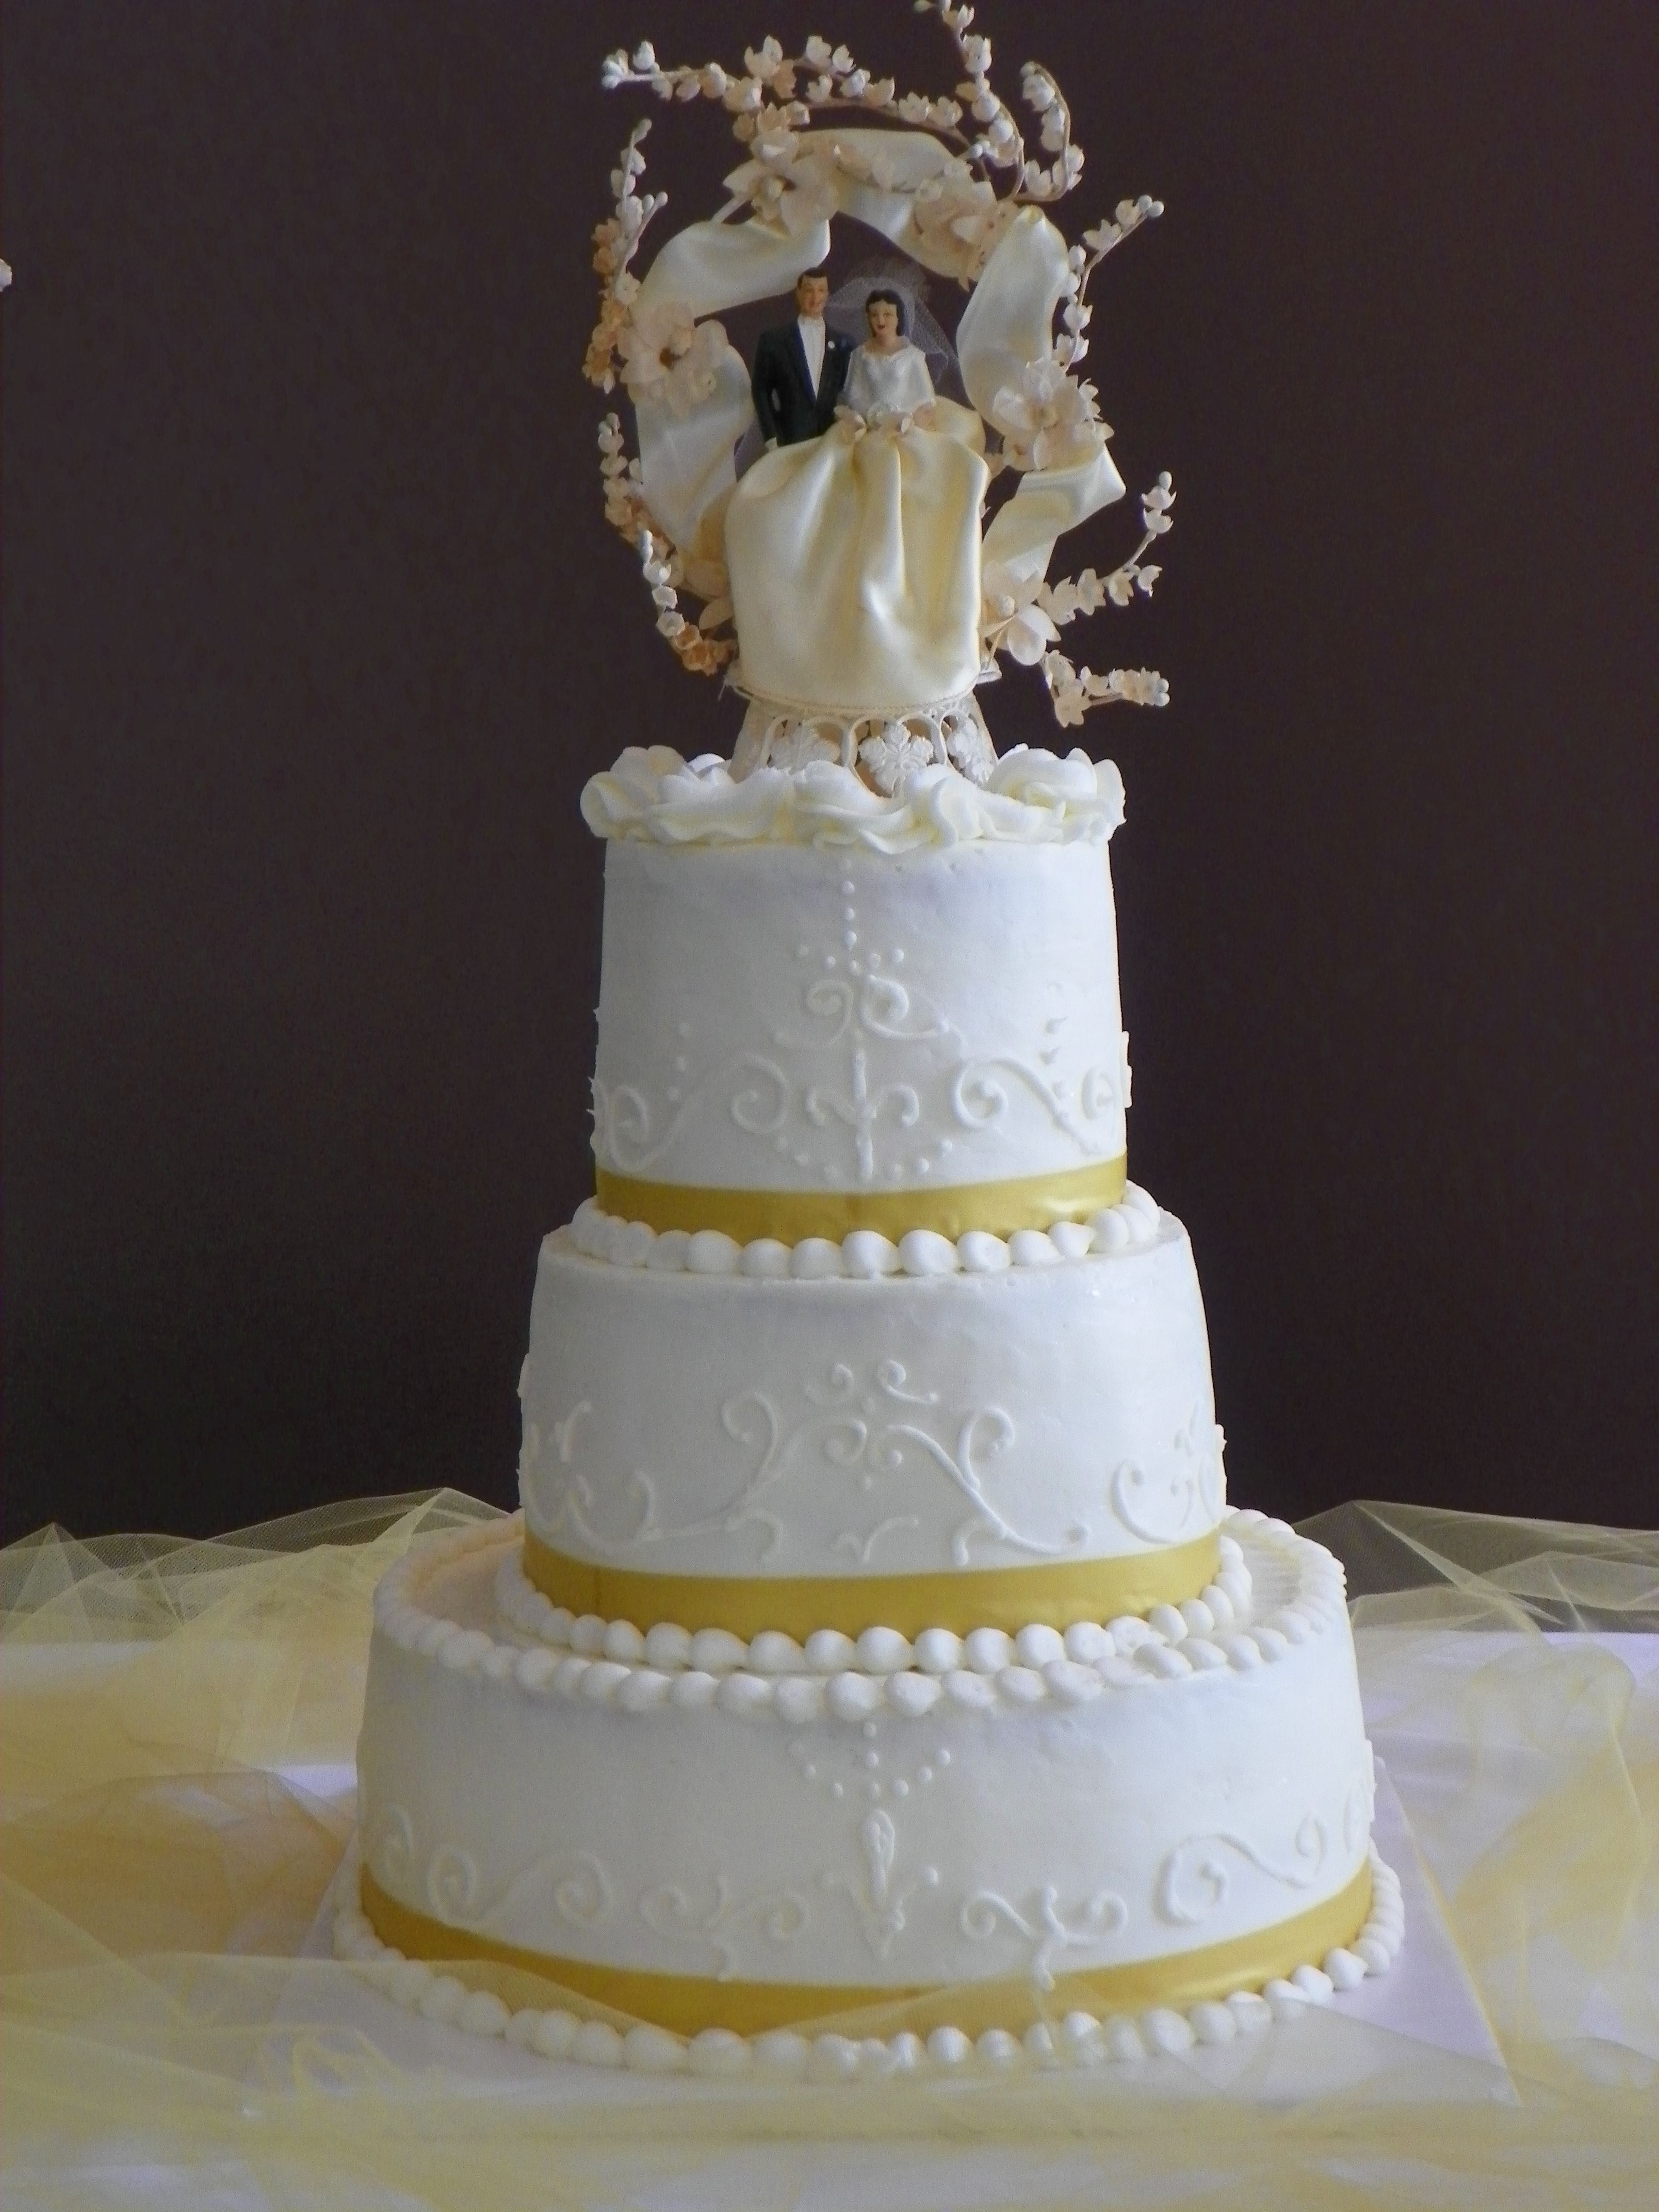 Th wedding anniversary cake parties pinterest